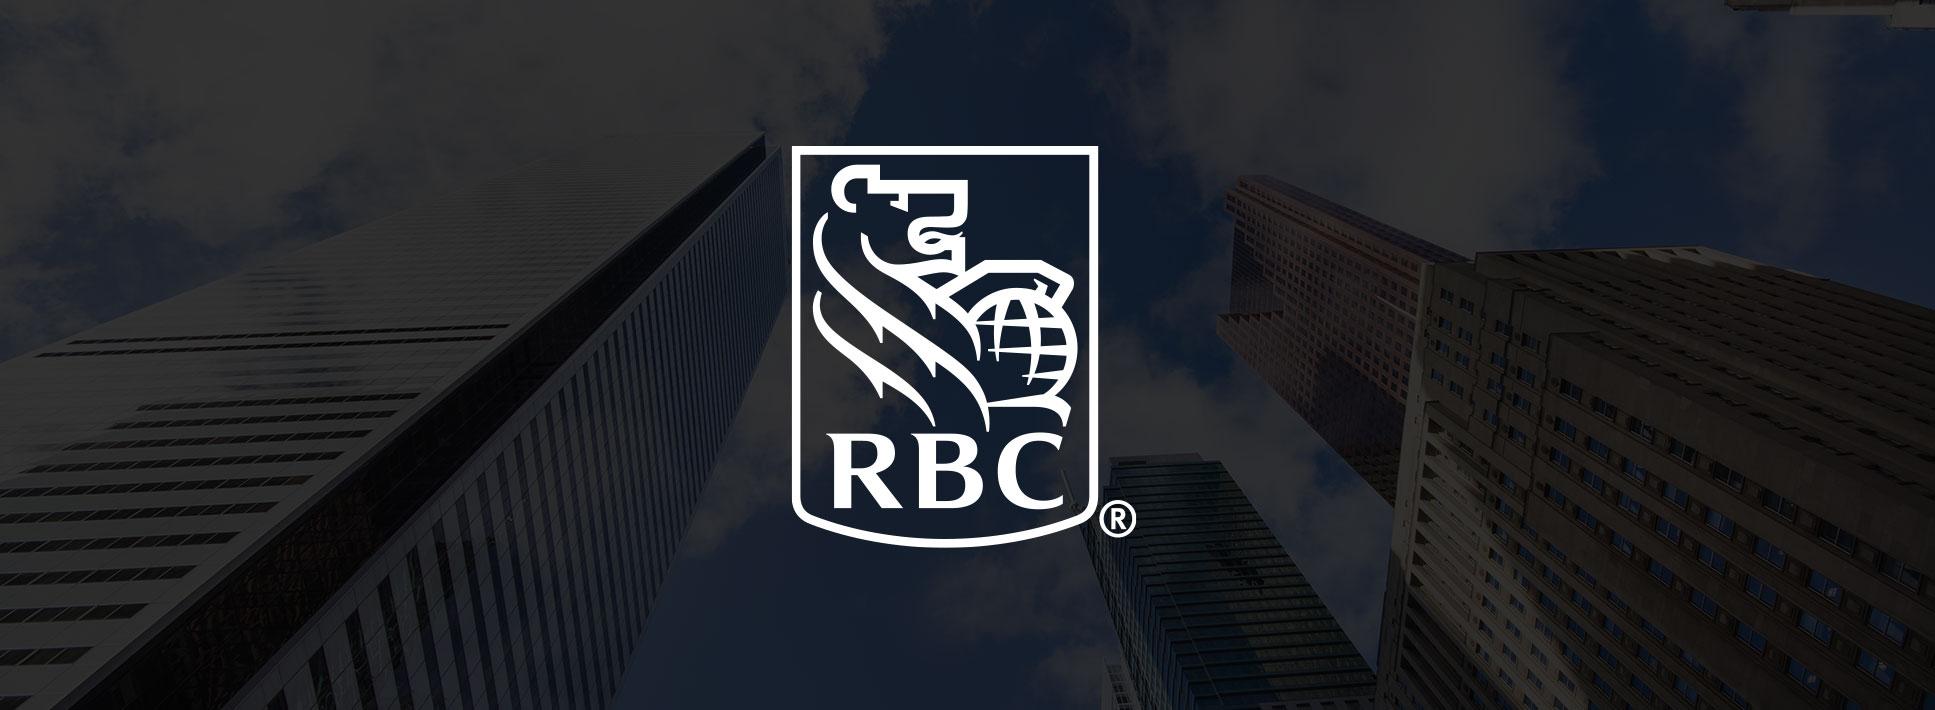 Royal Bank of Canada F1 Formula 1 Williams Nicholas Latifi